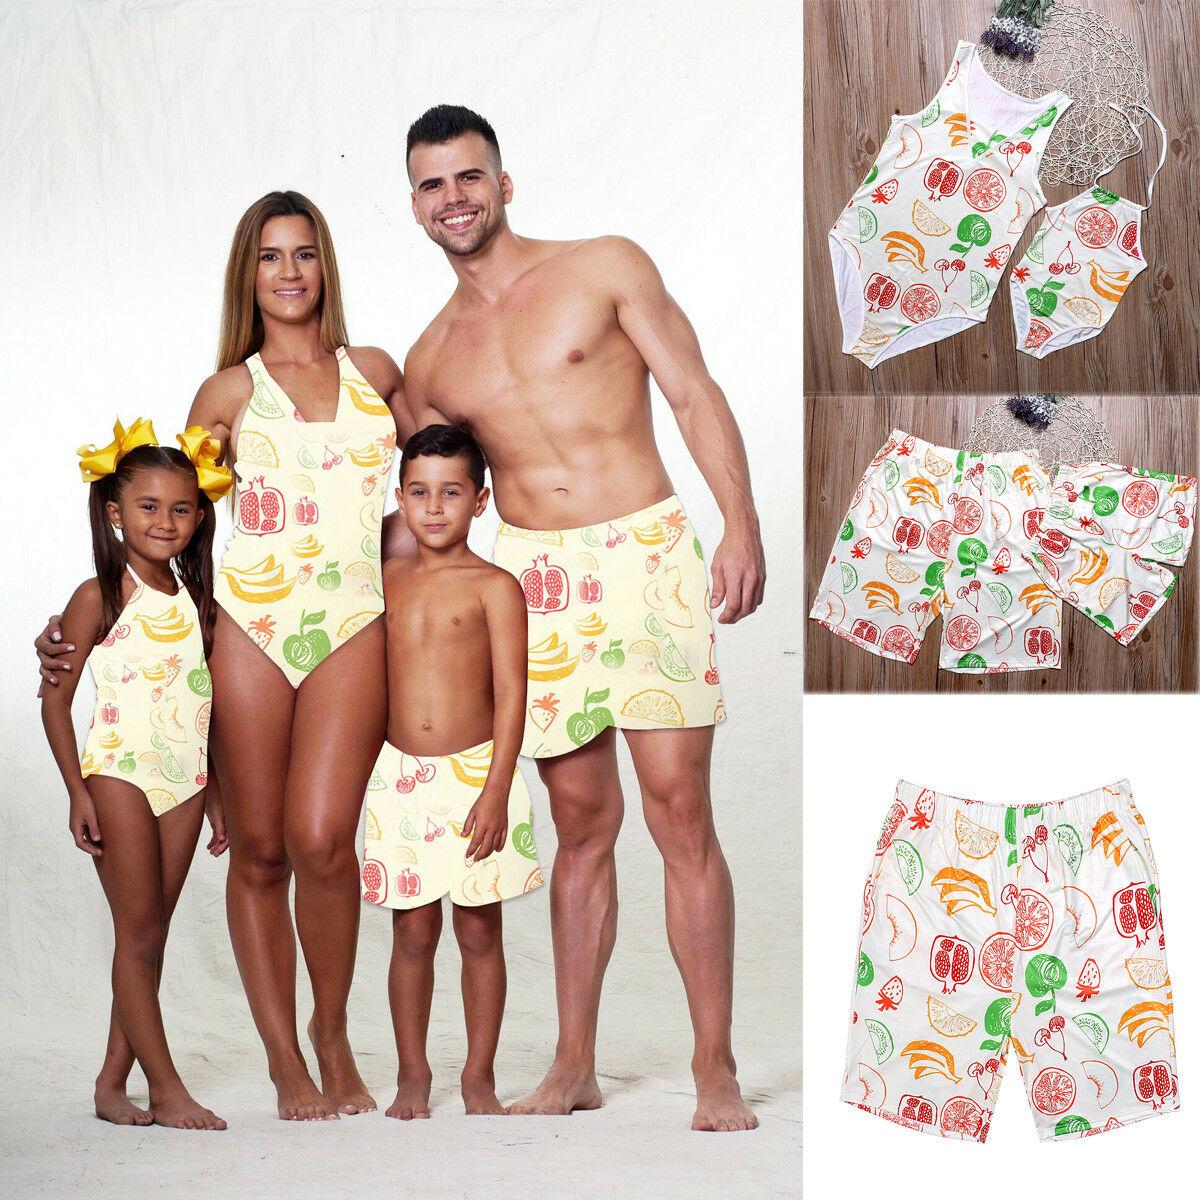 Family Matching Swimsuit Mother Girls One Piece Swimsuit Father Boys Shorts Swimwear Bikini Sets Fruit Print